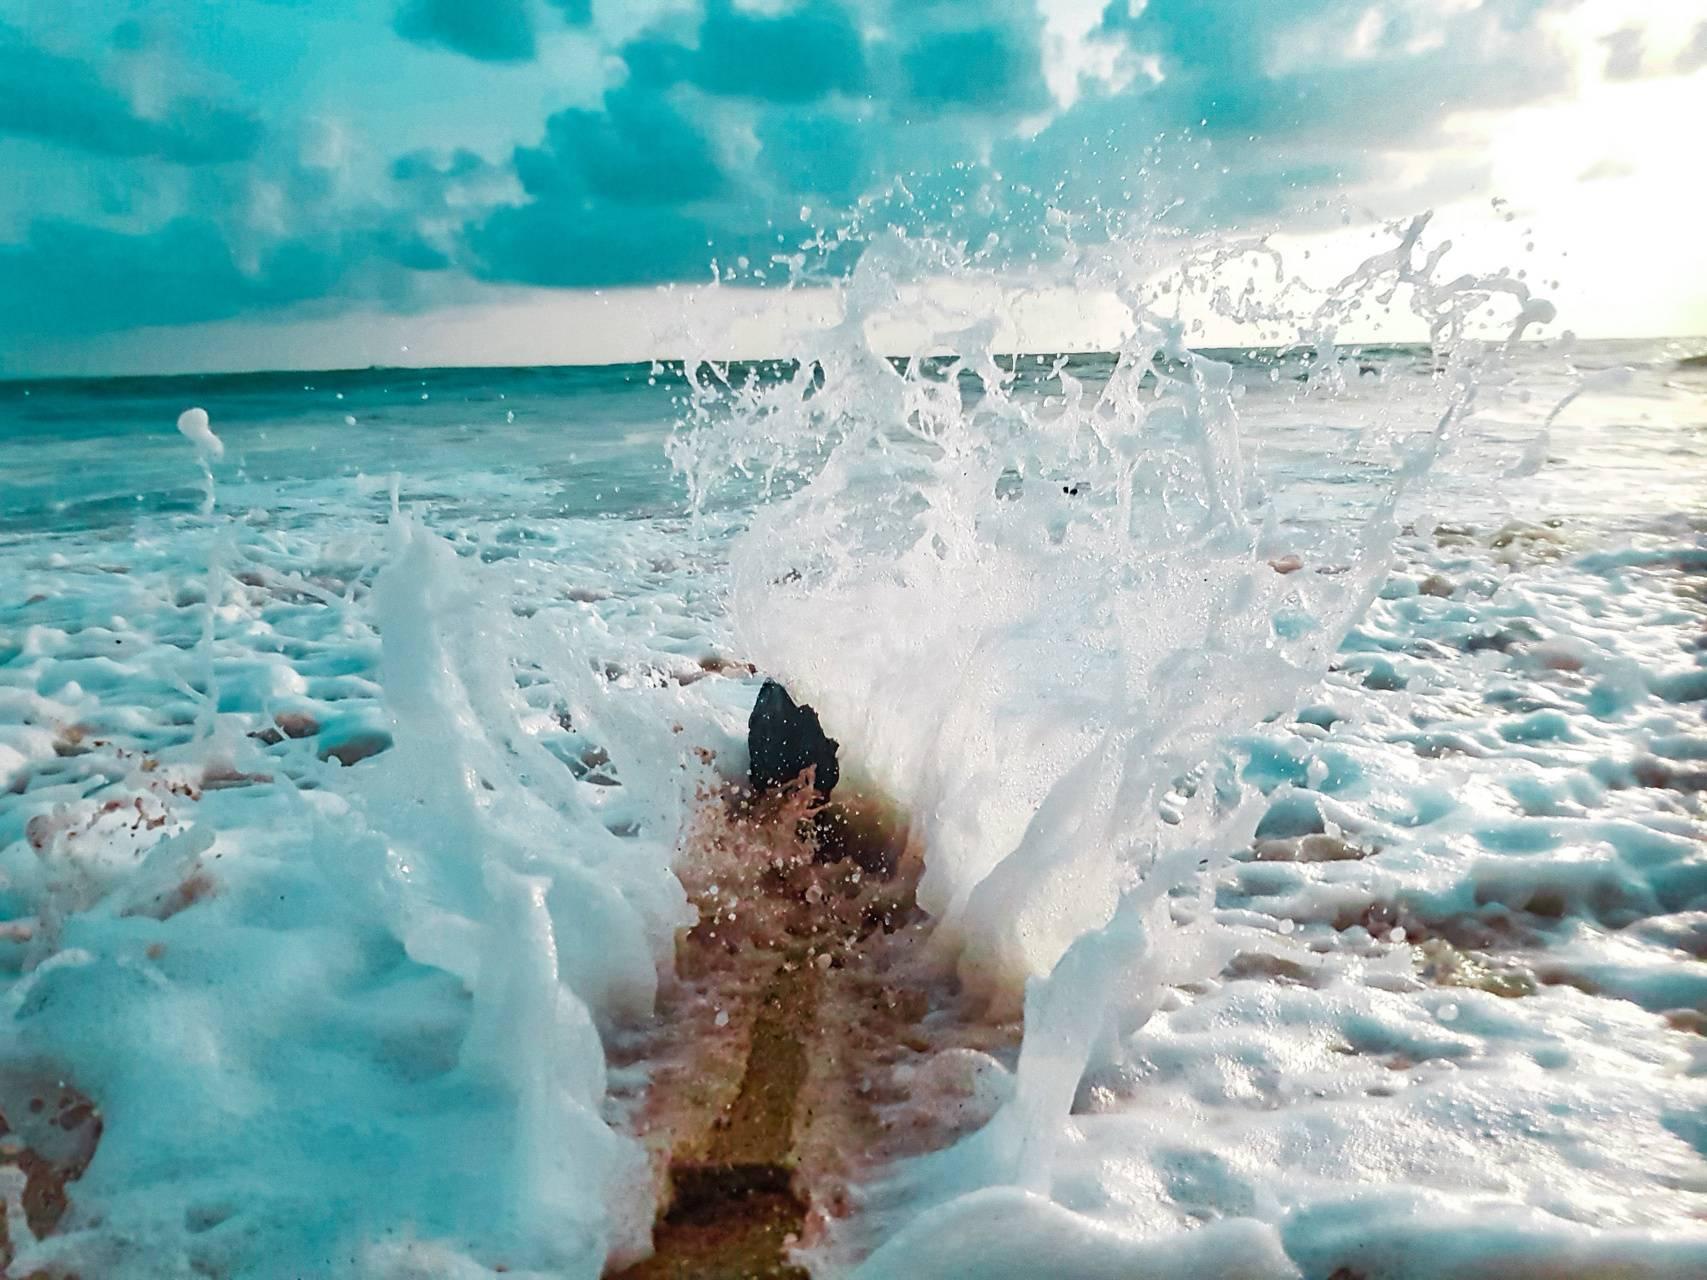 Pearls of waves